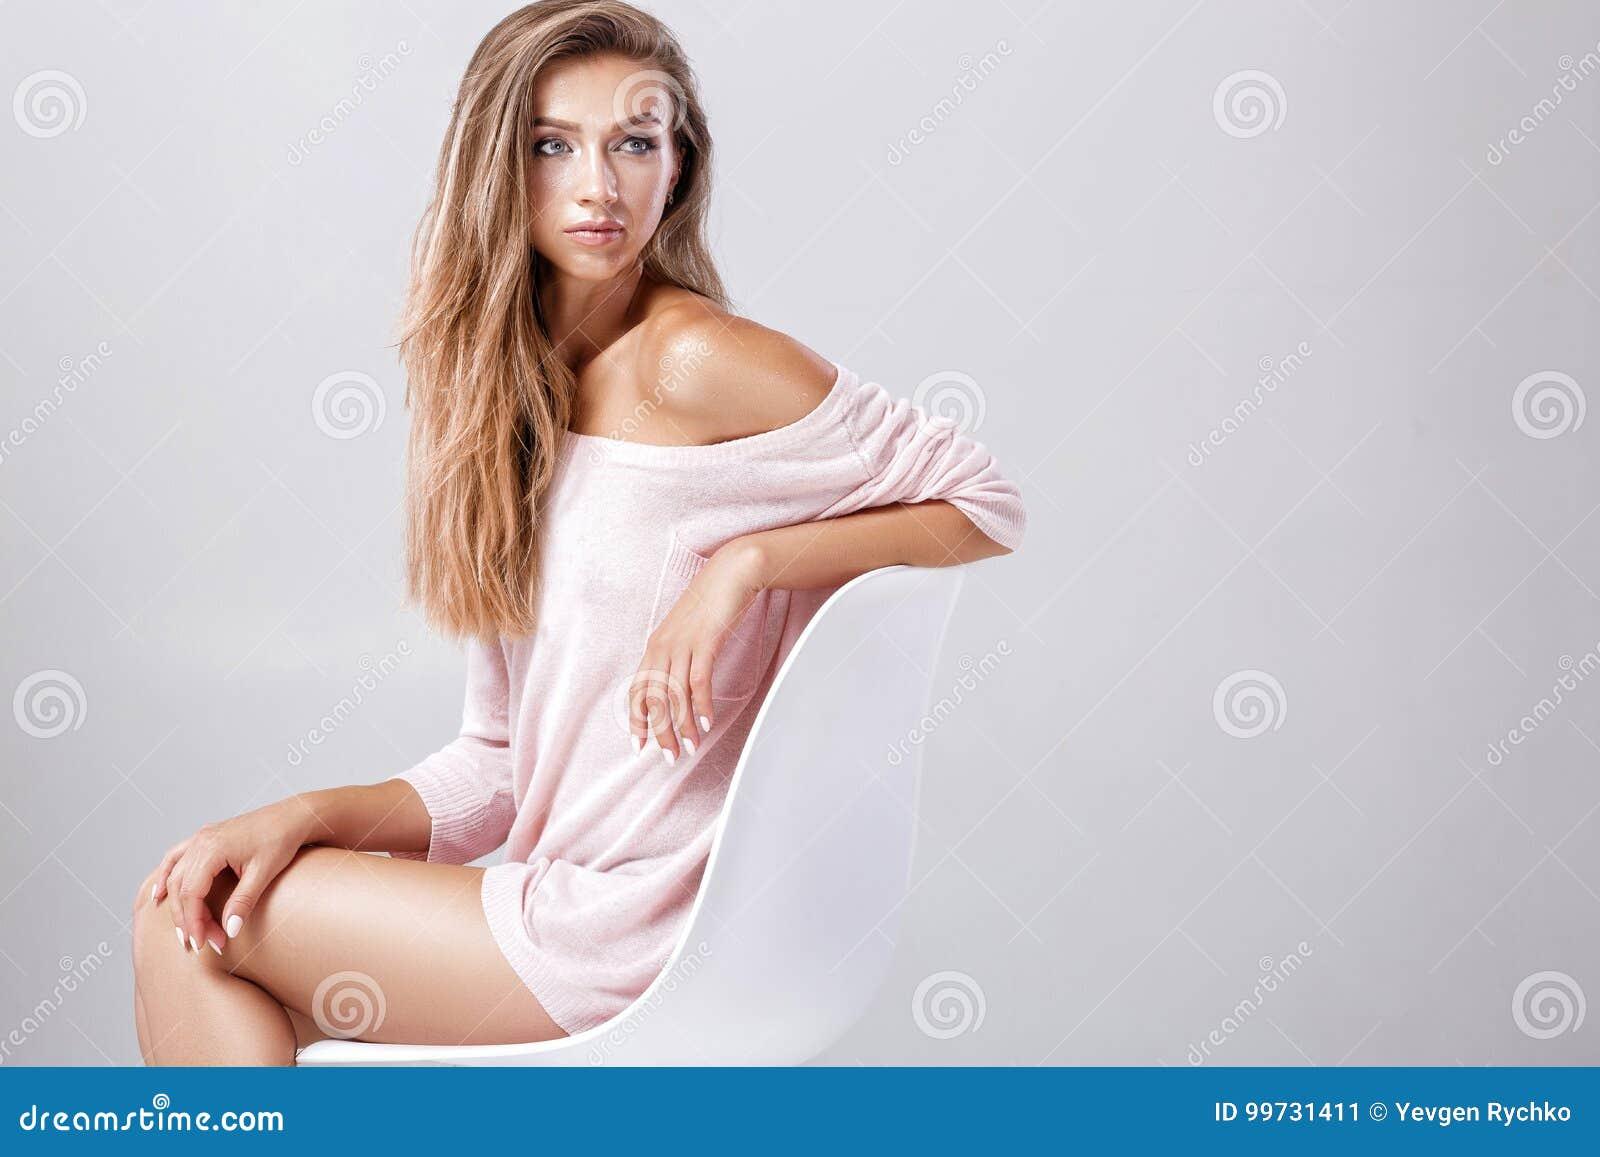 krasivoe-erotichnoe-foto-na-stule